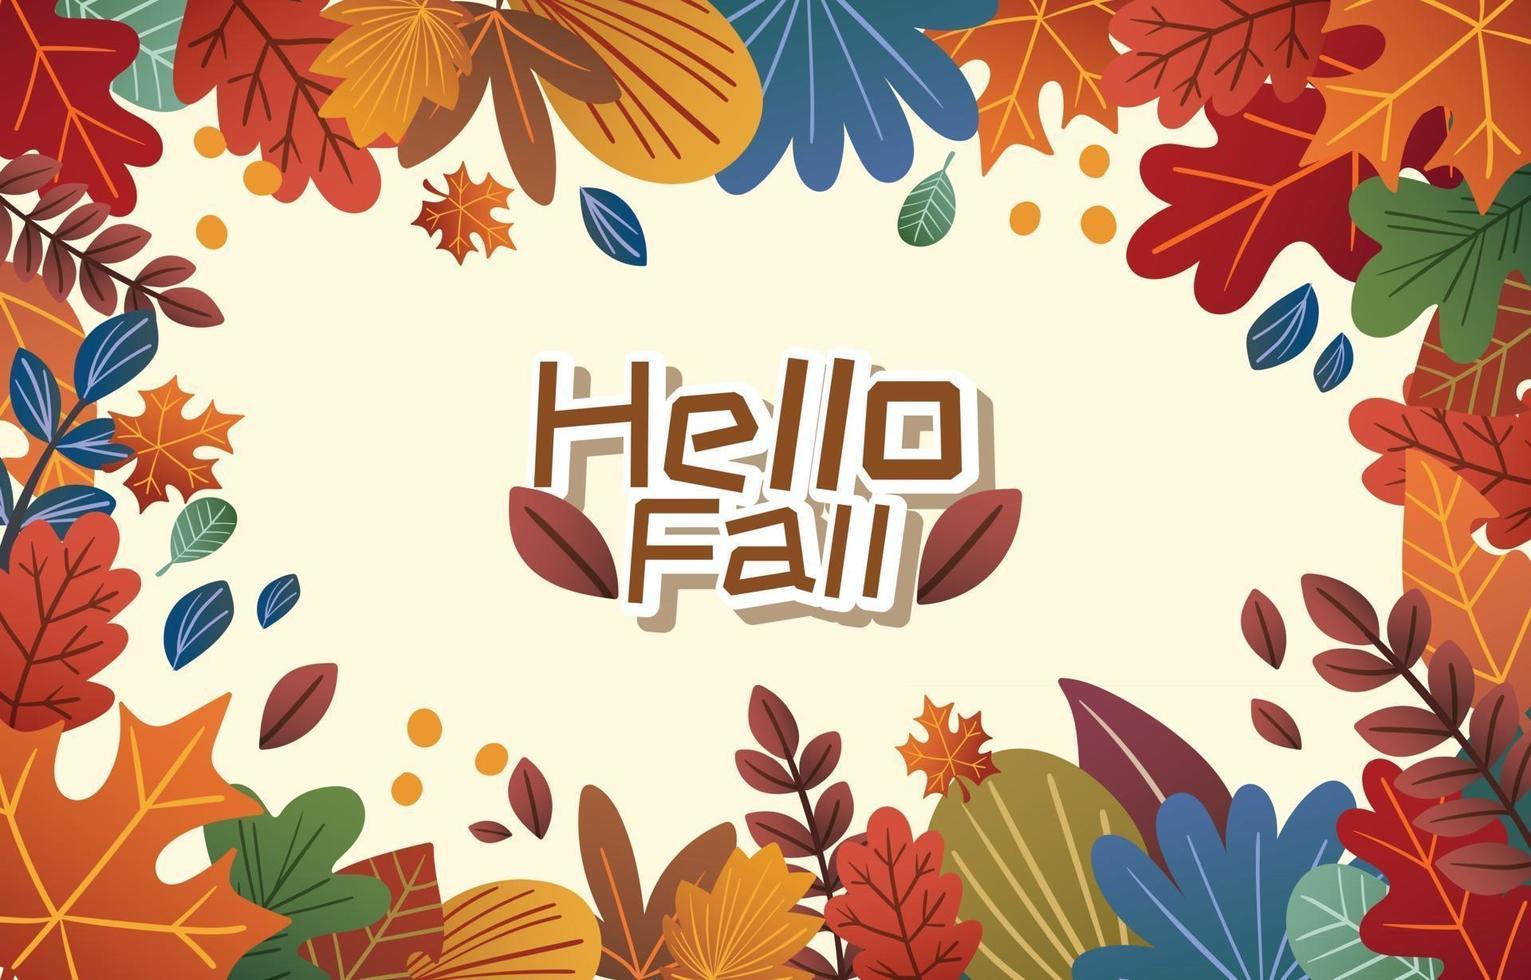 hallo herfst seizoen achtergrond vector